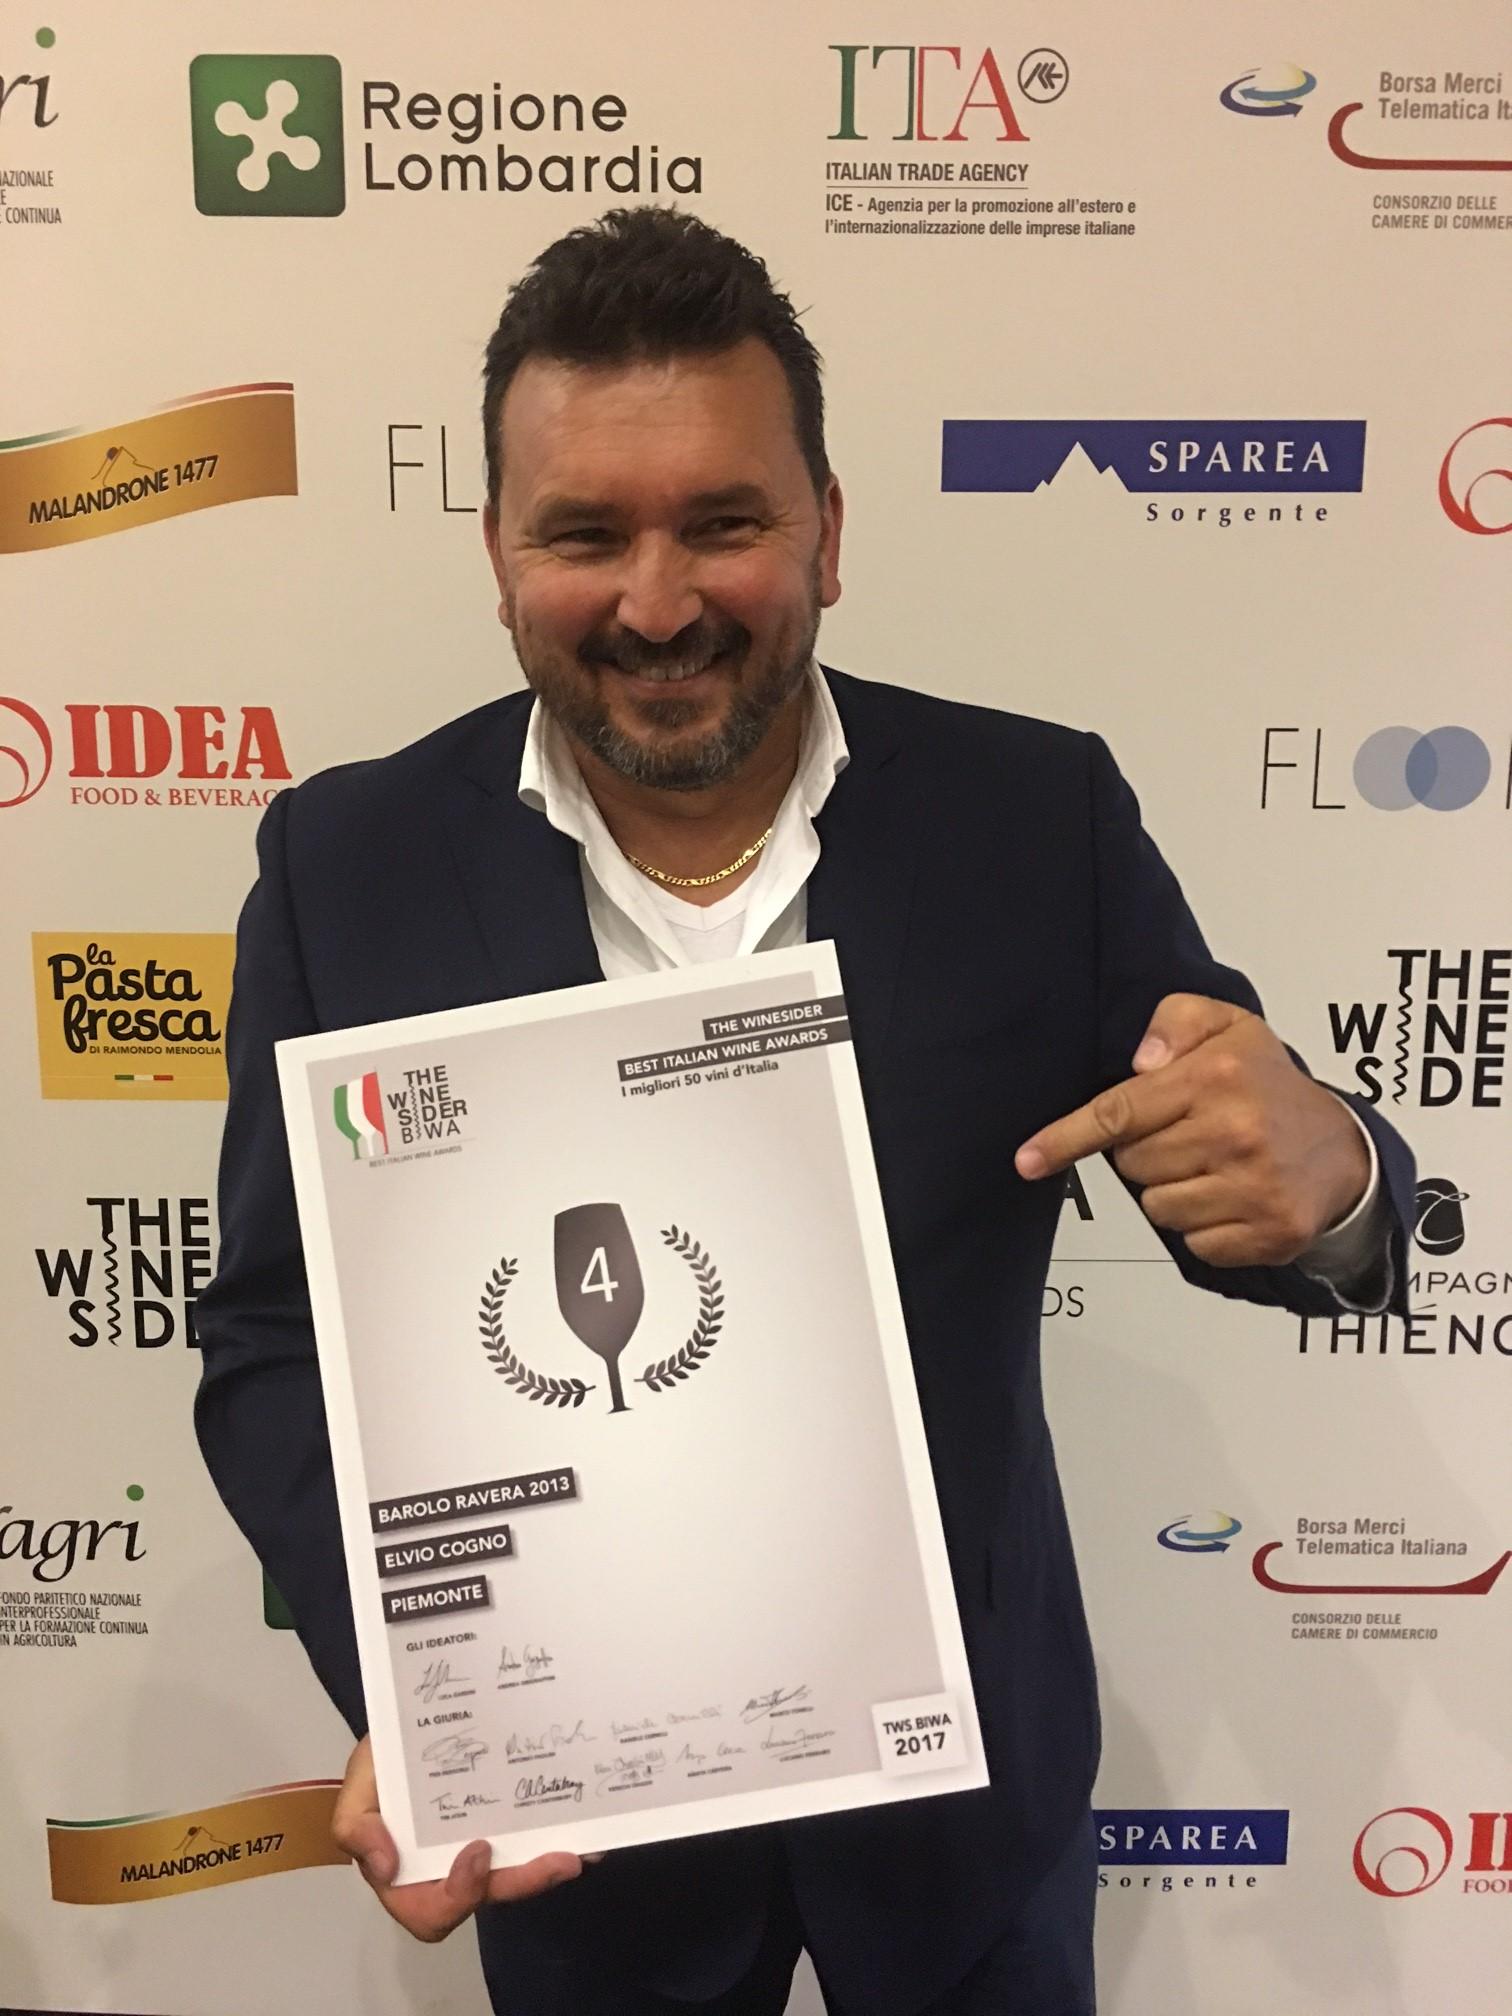 The Winesider Best Italian Wine Awards 2017